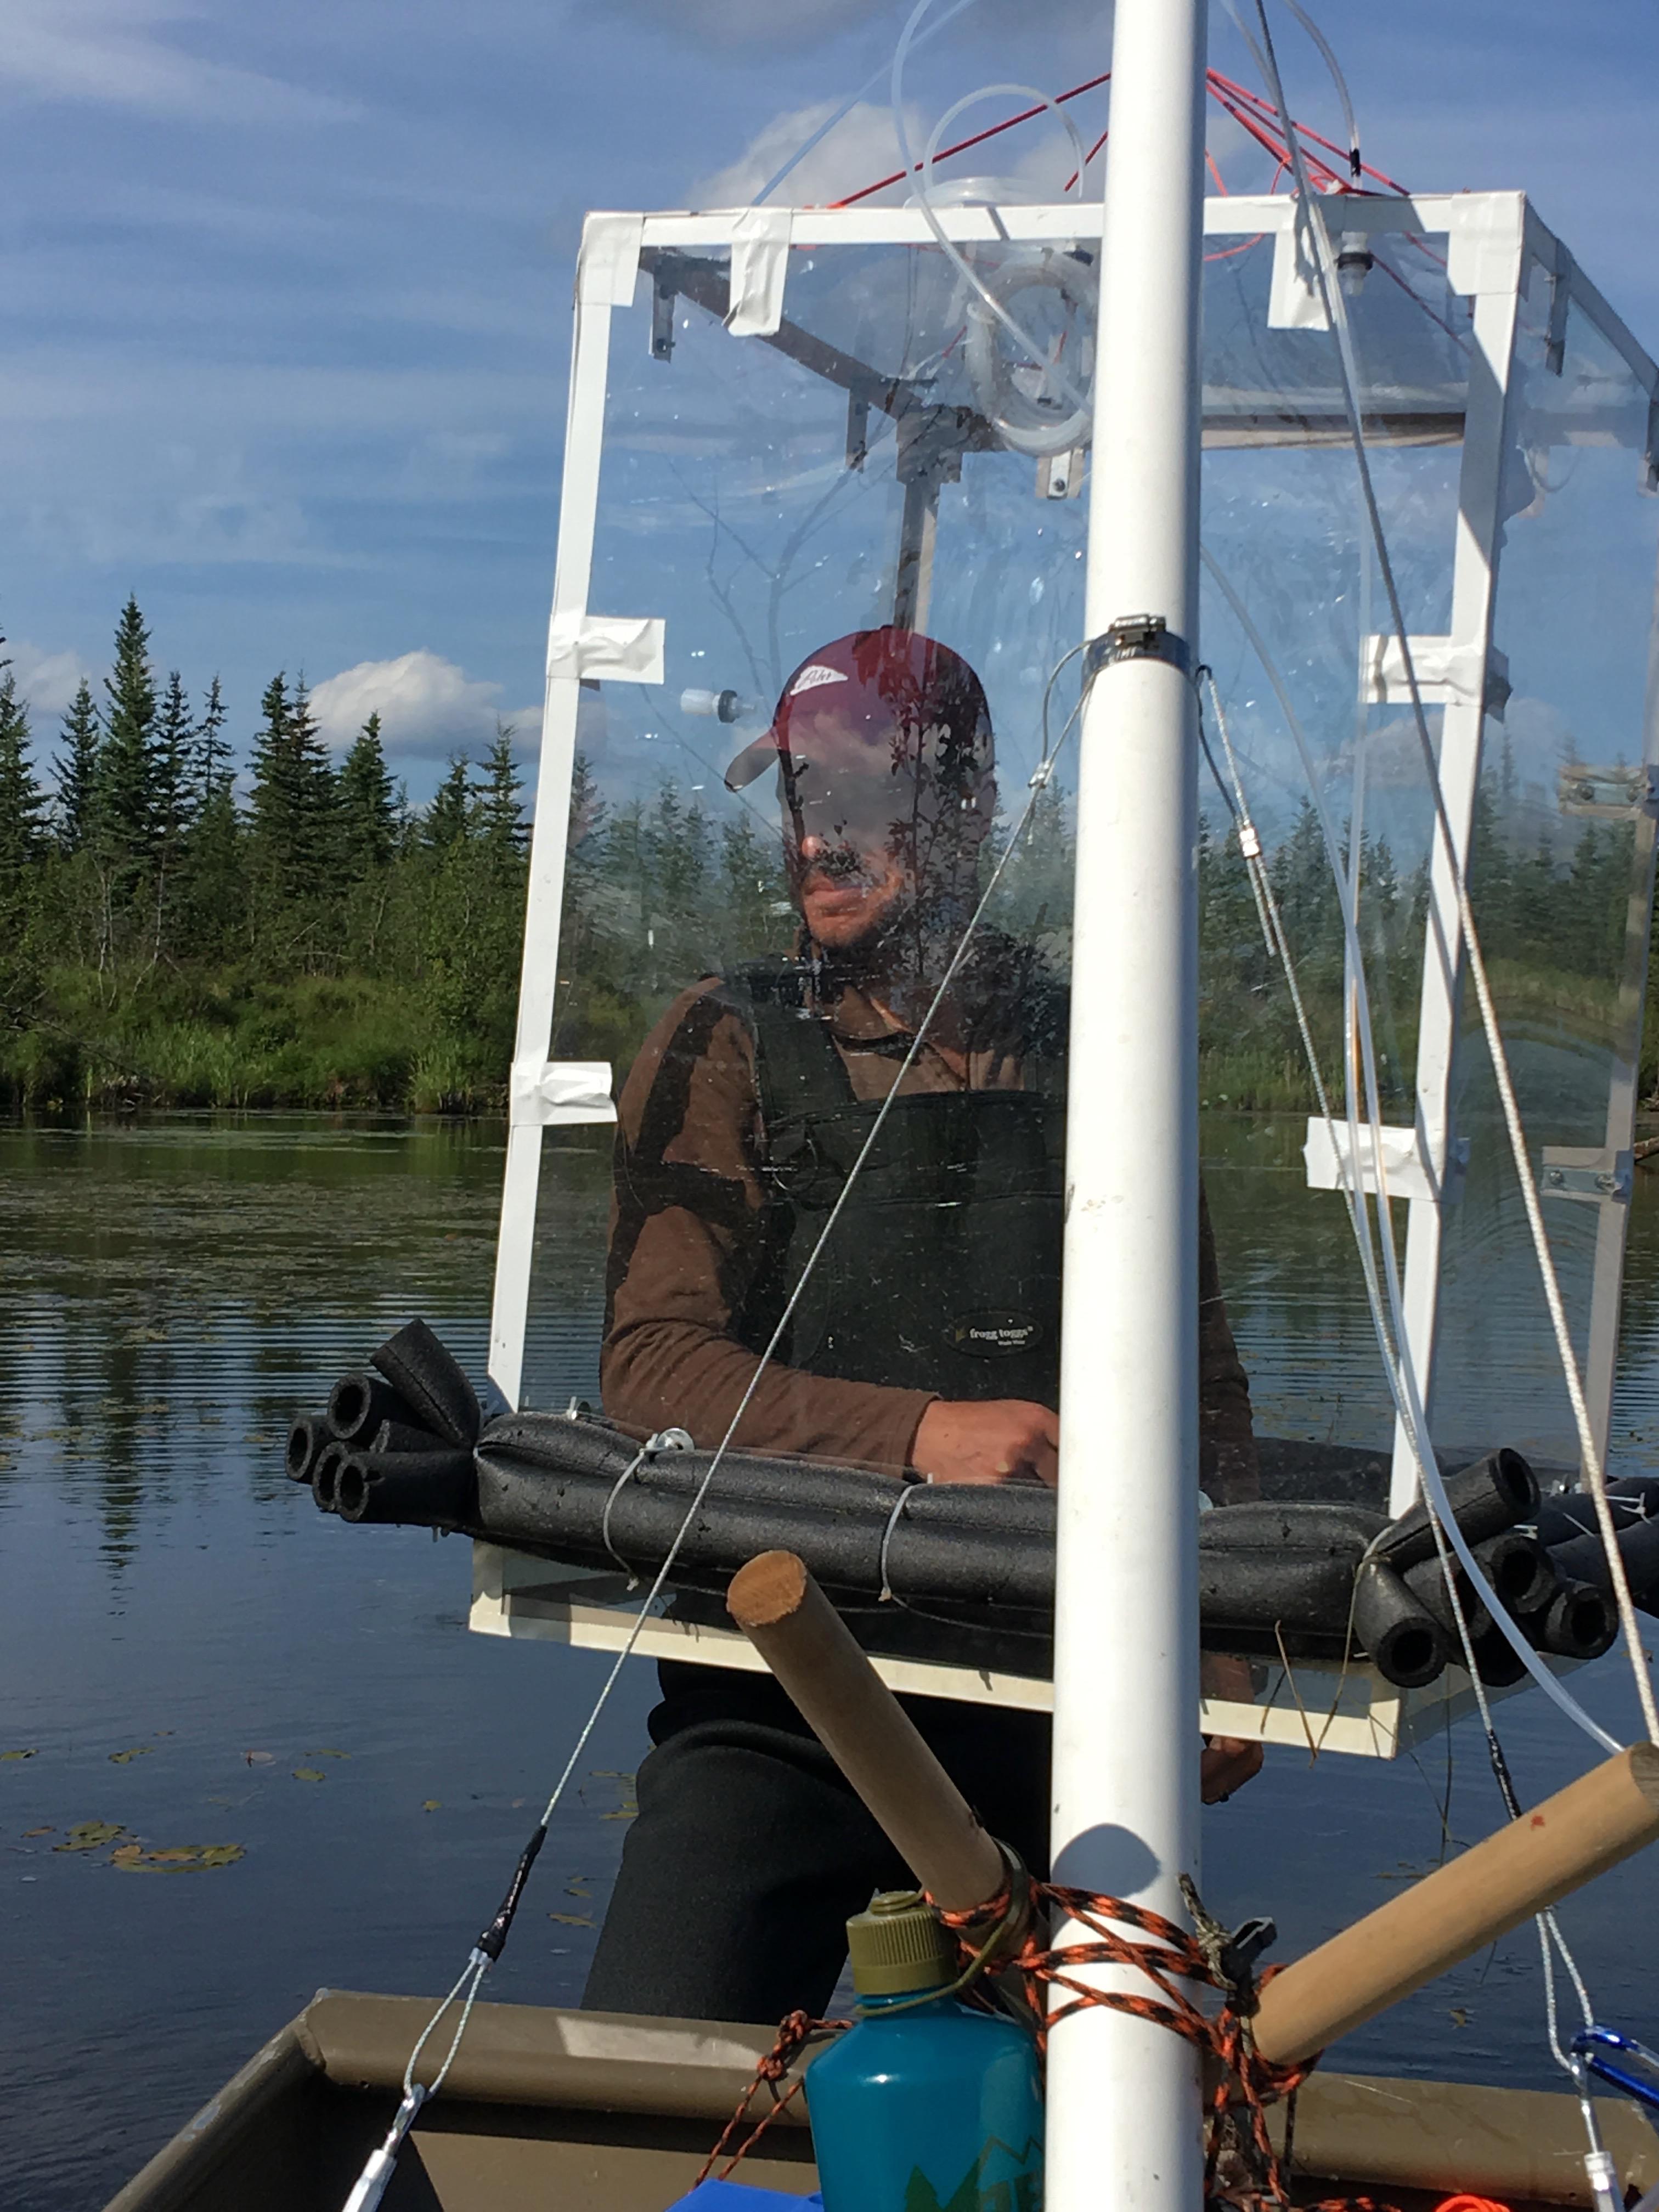 NASA JPL postdoctoral fellow Clayton Elder measures methane bubbling up from Big Trail Lake outside of Fairbanks, Alaska.